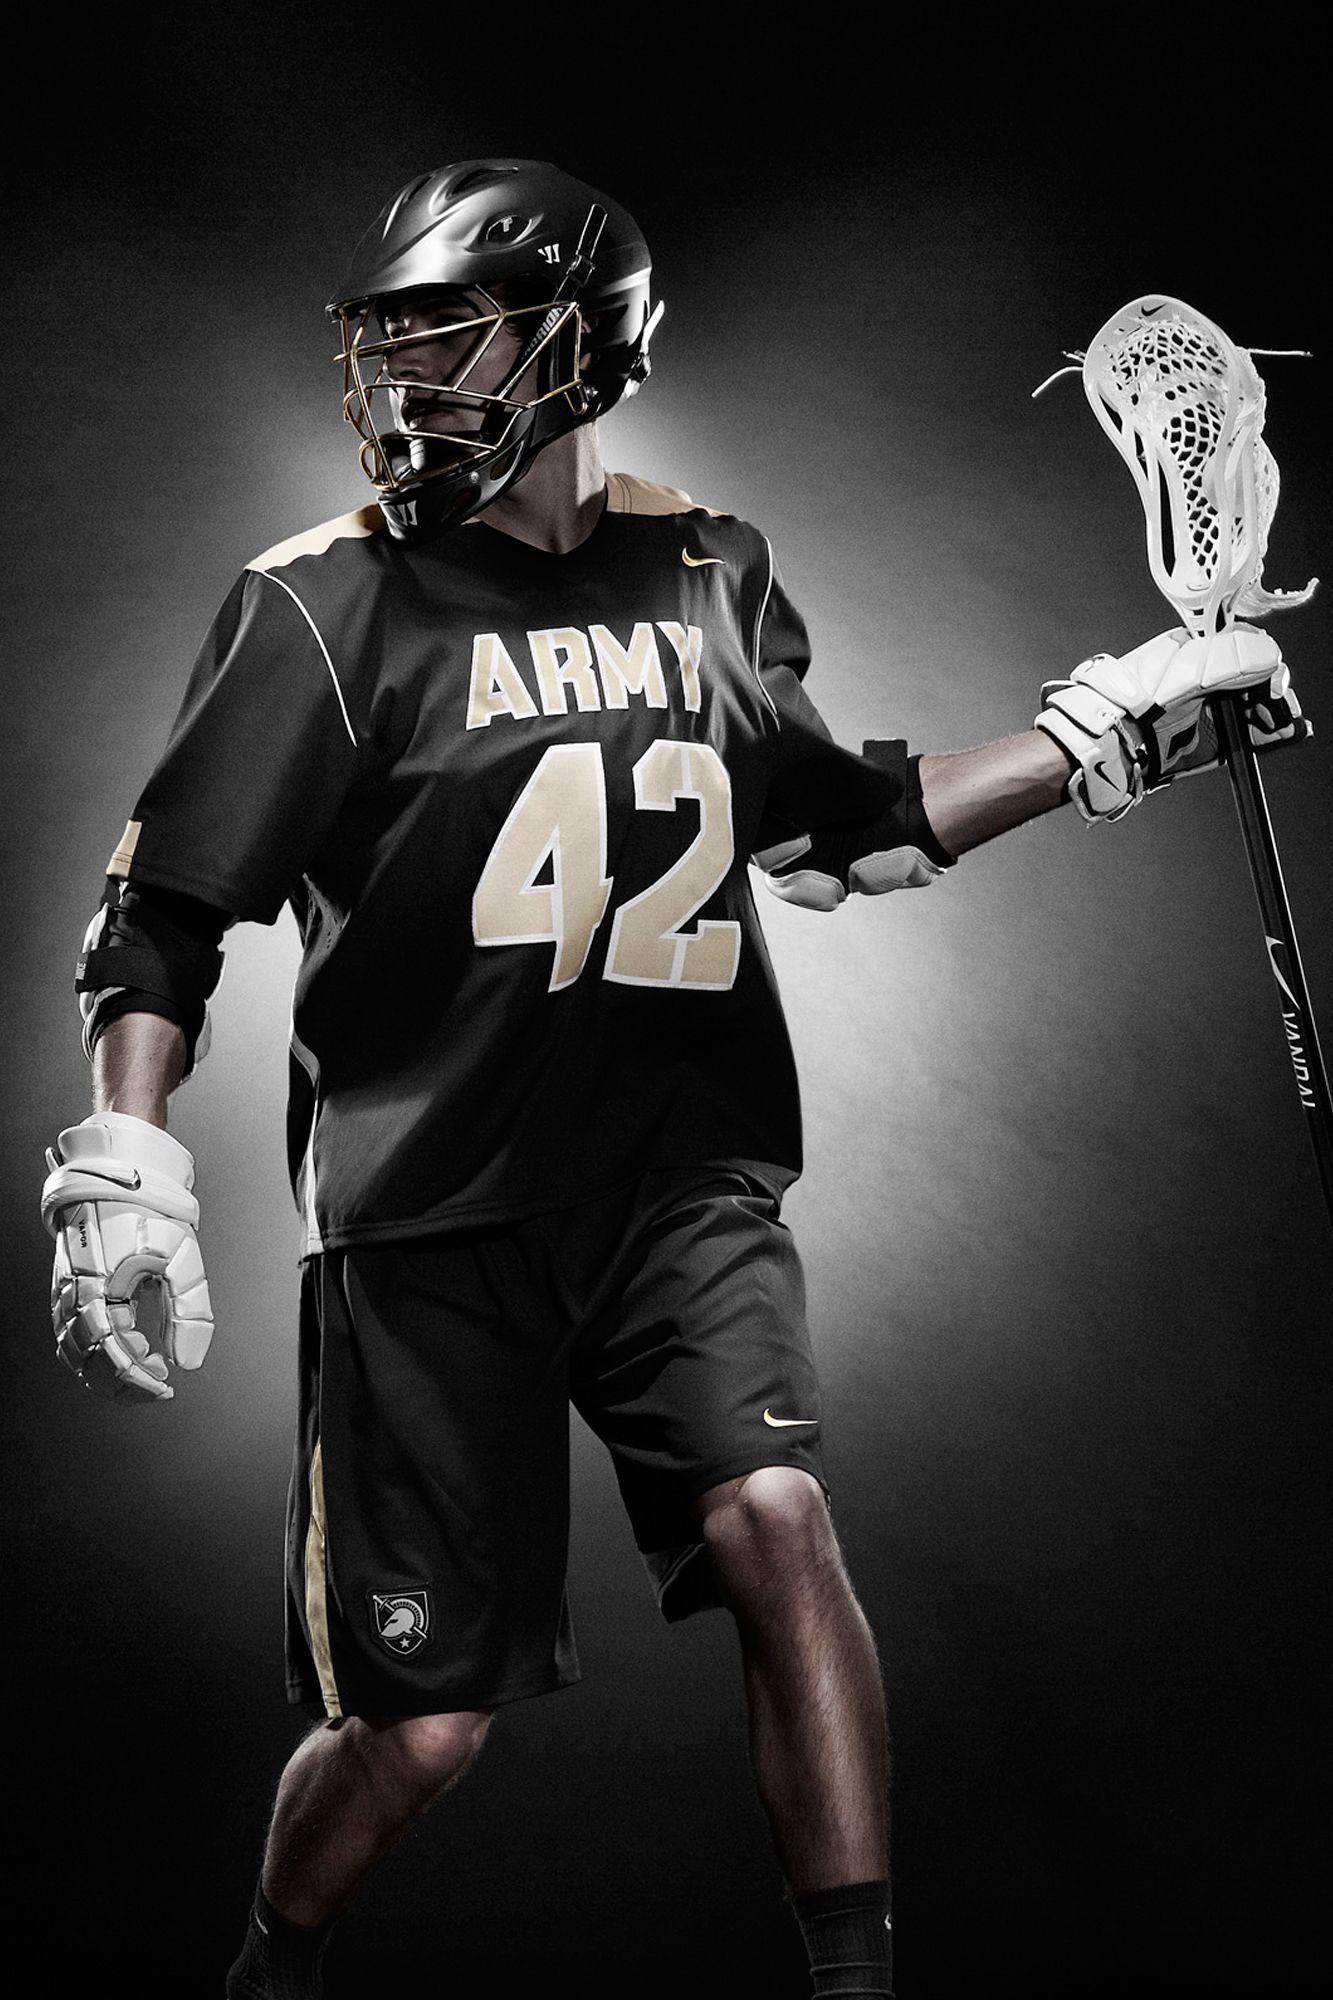 1f60d6bf7d730d 2015 Army West Point uniforms by Nike - Men s Lacrosse